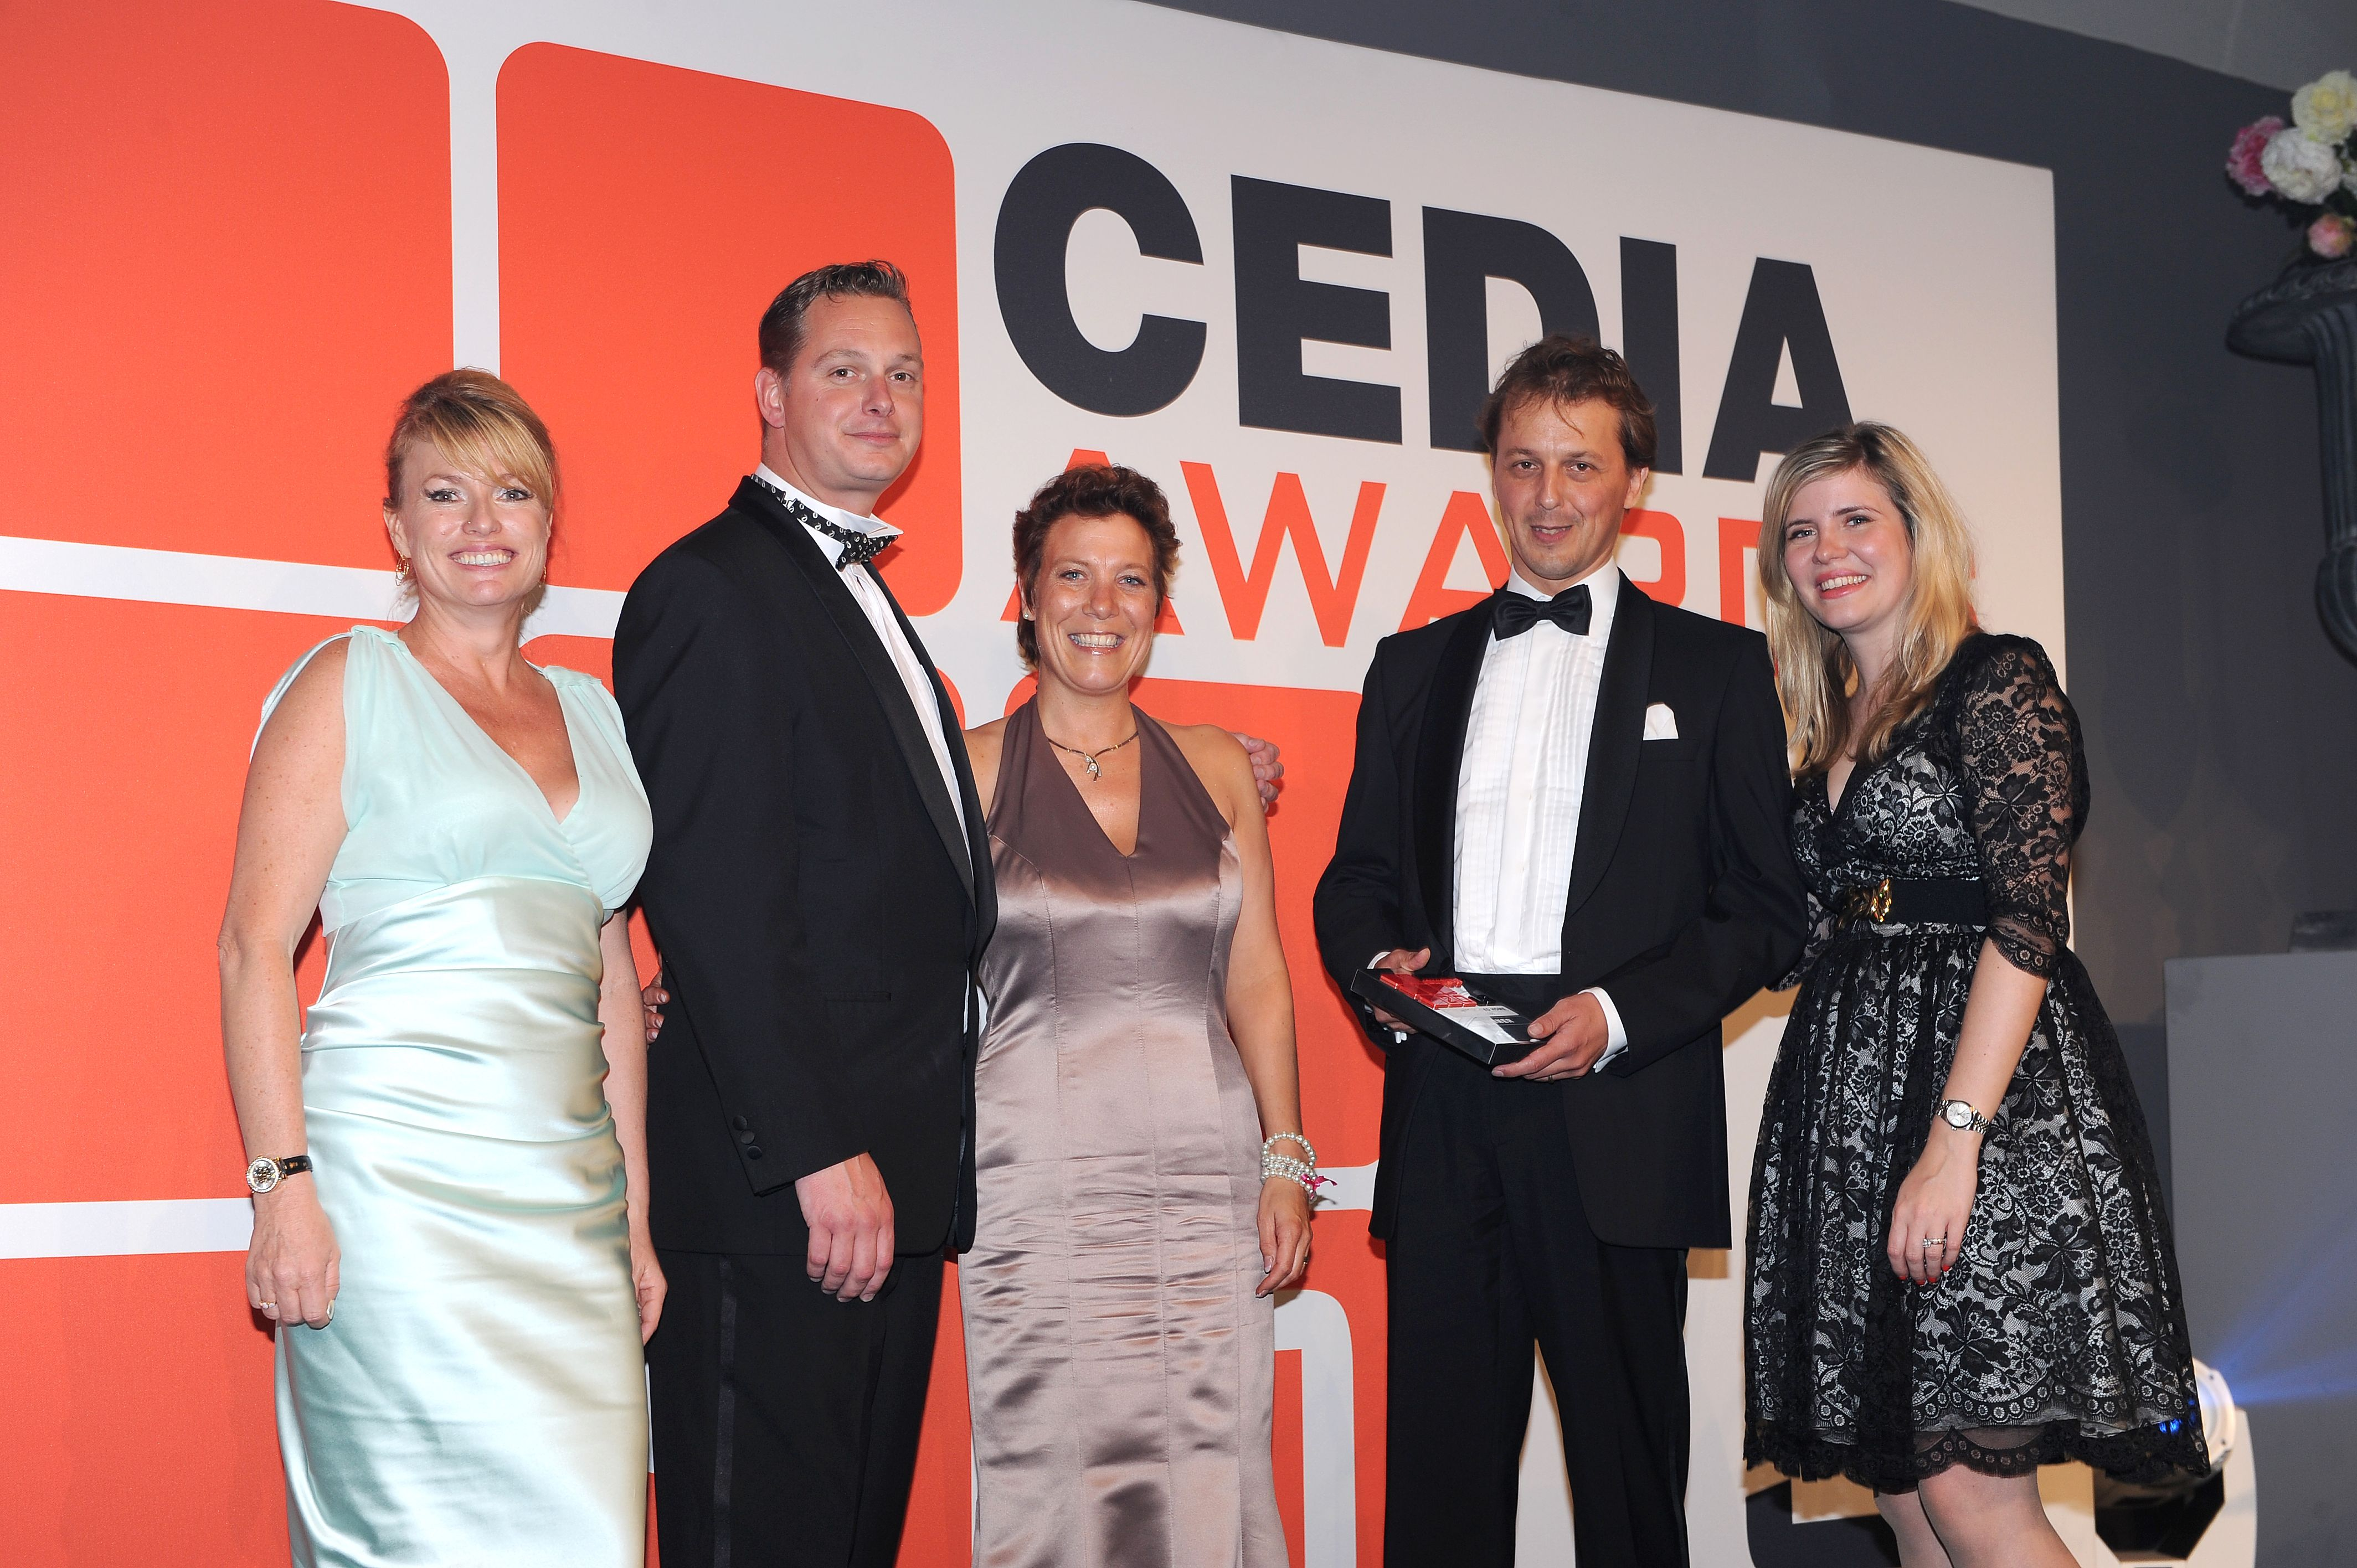 Cedia awards 2013 de opera domotica win best integrated home over